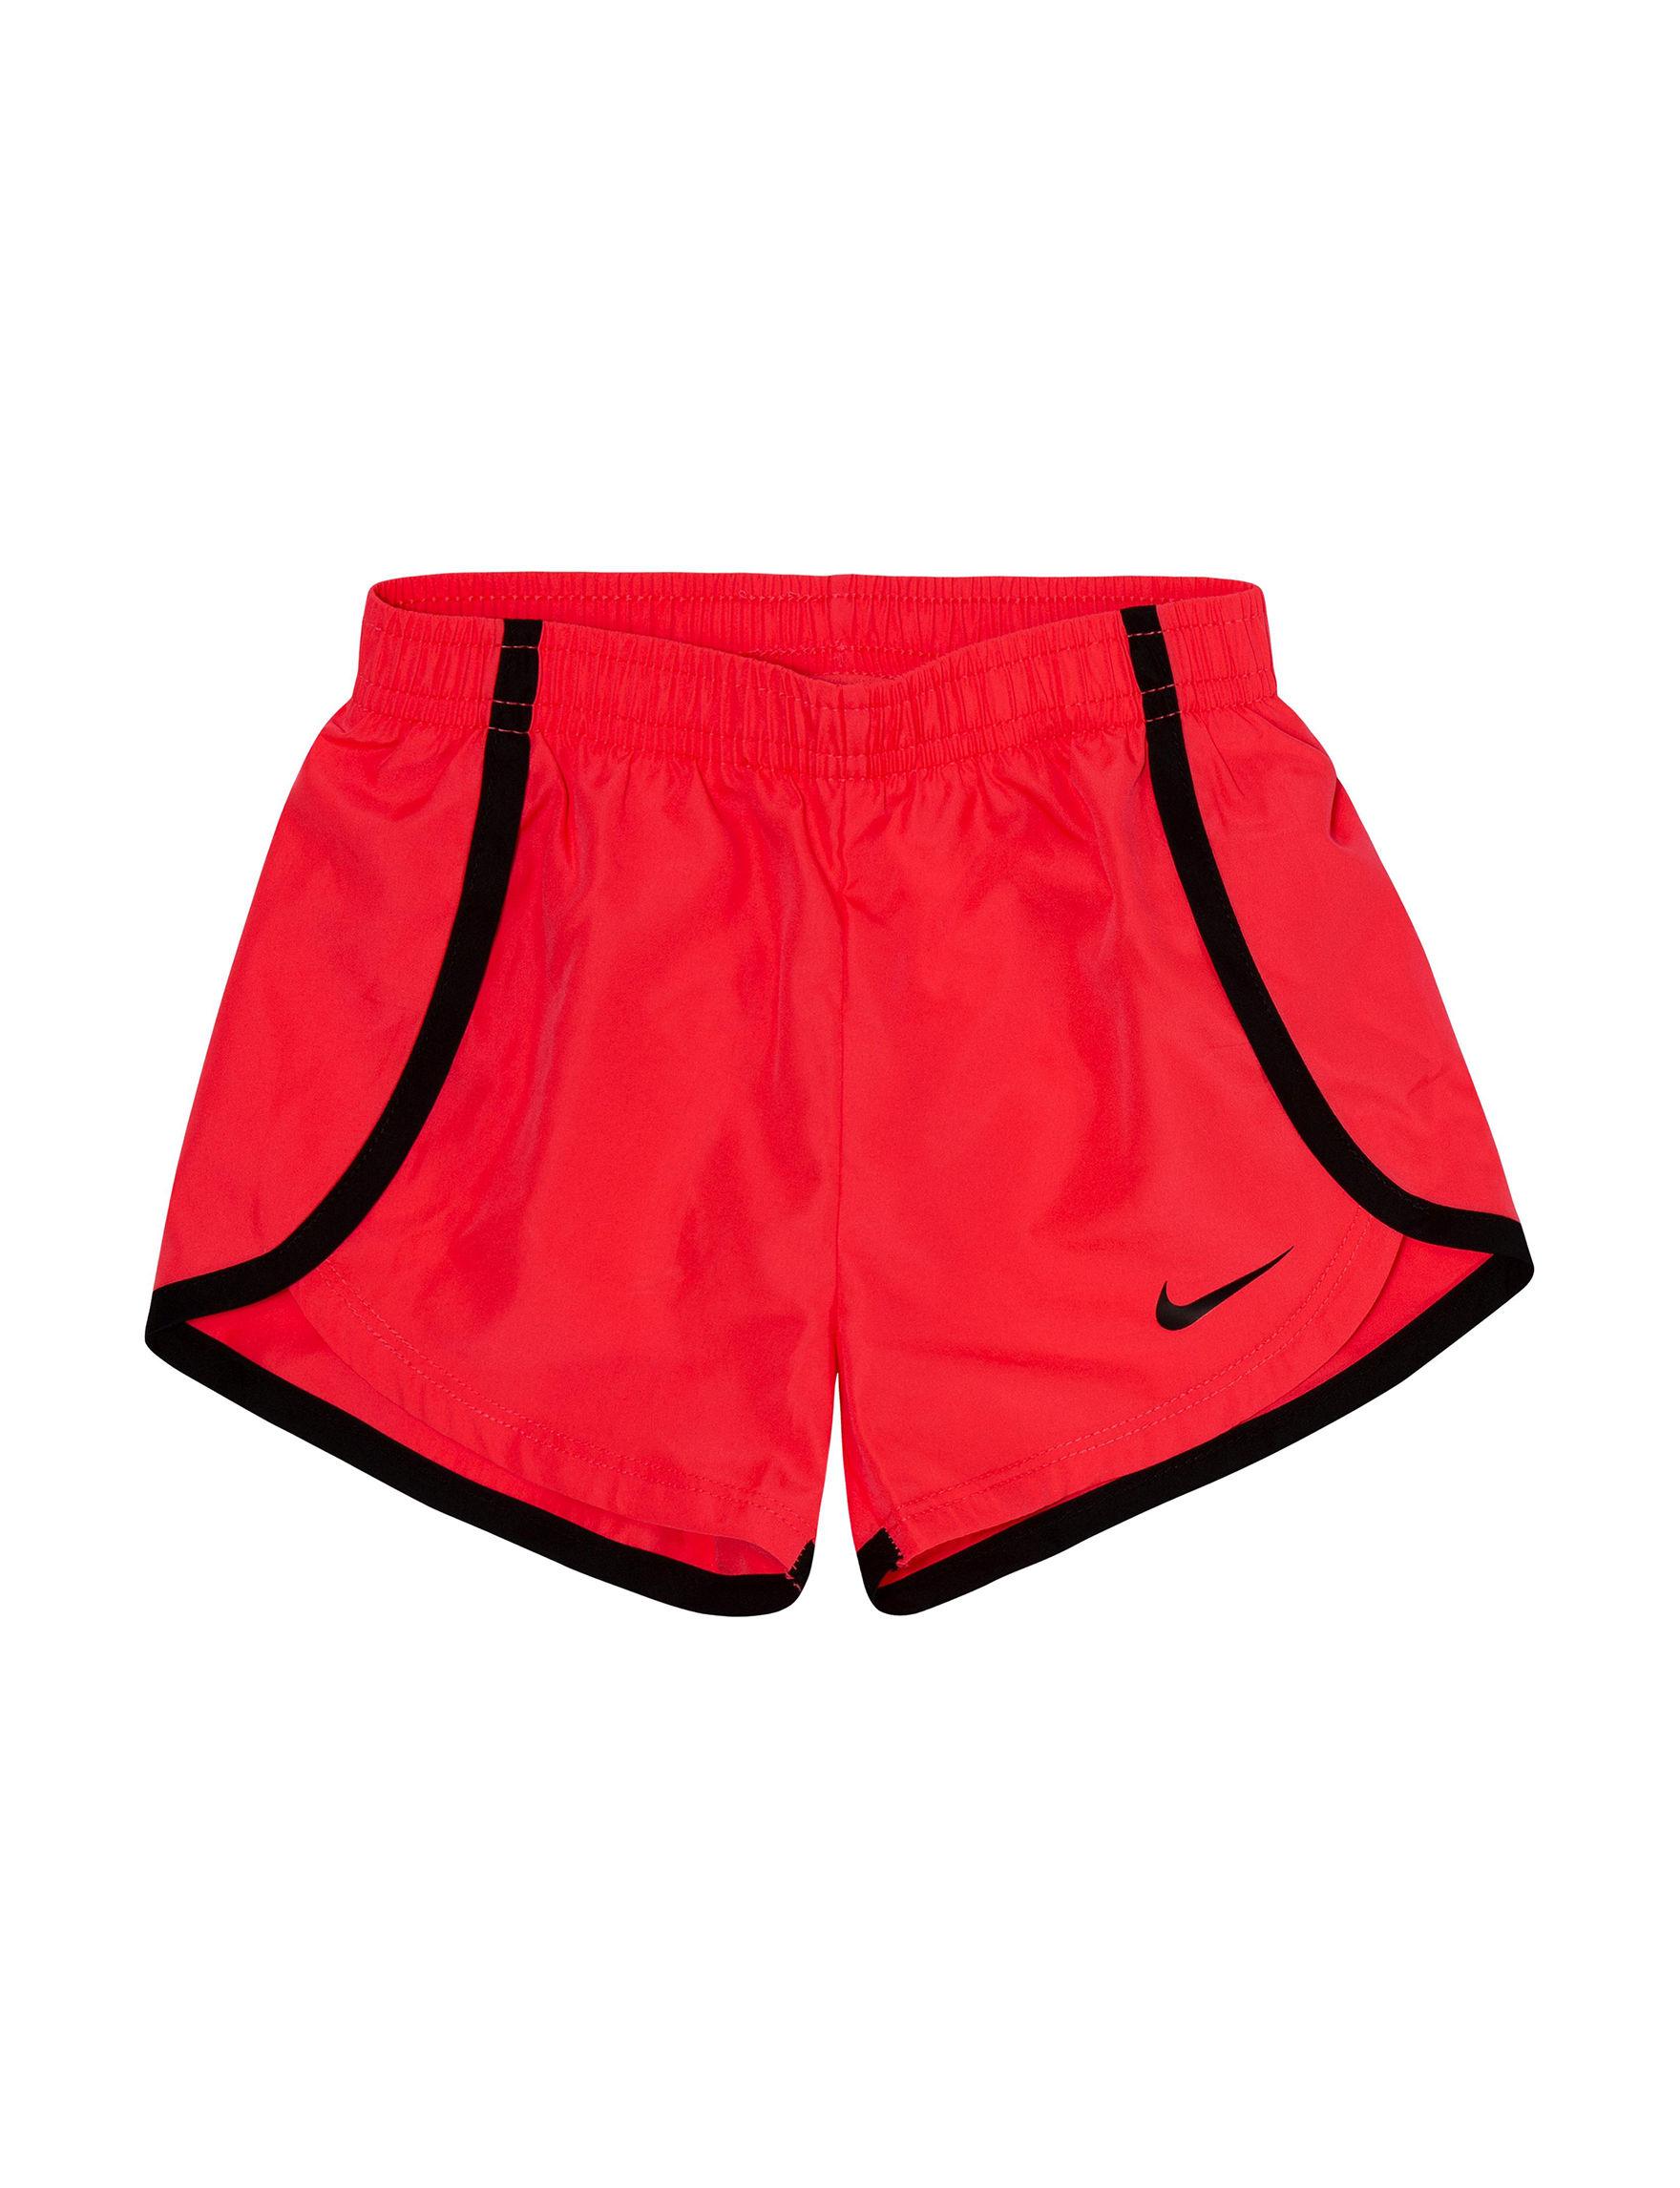 Nike Bright Red / Black